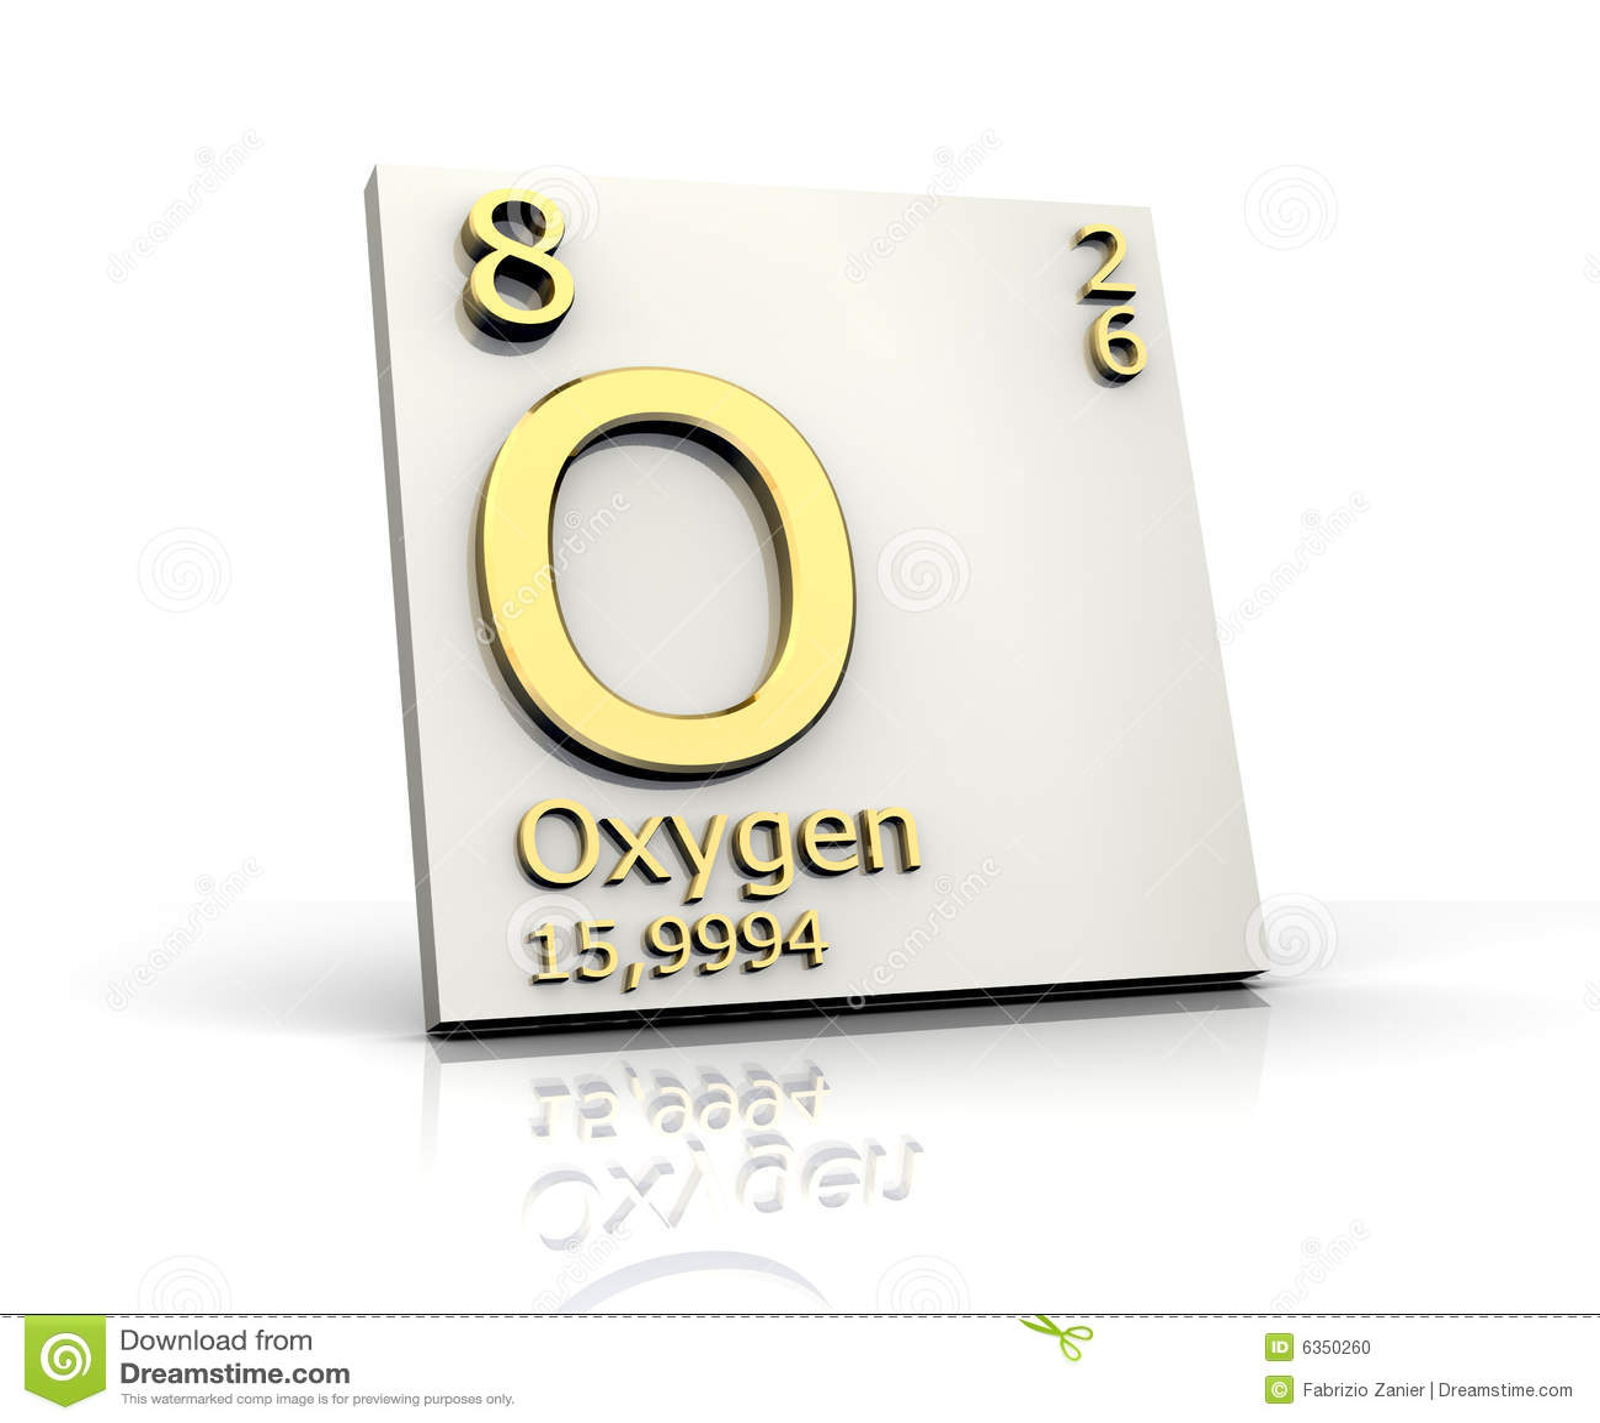 Oxygen form periodic table of elements stock illustration oxygen form periodic table of elements urtaz Gallery